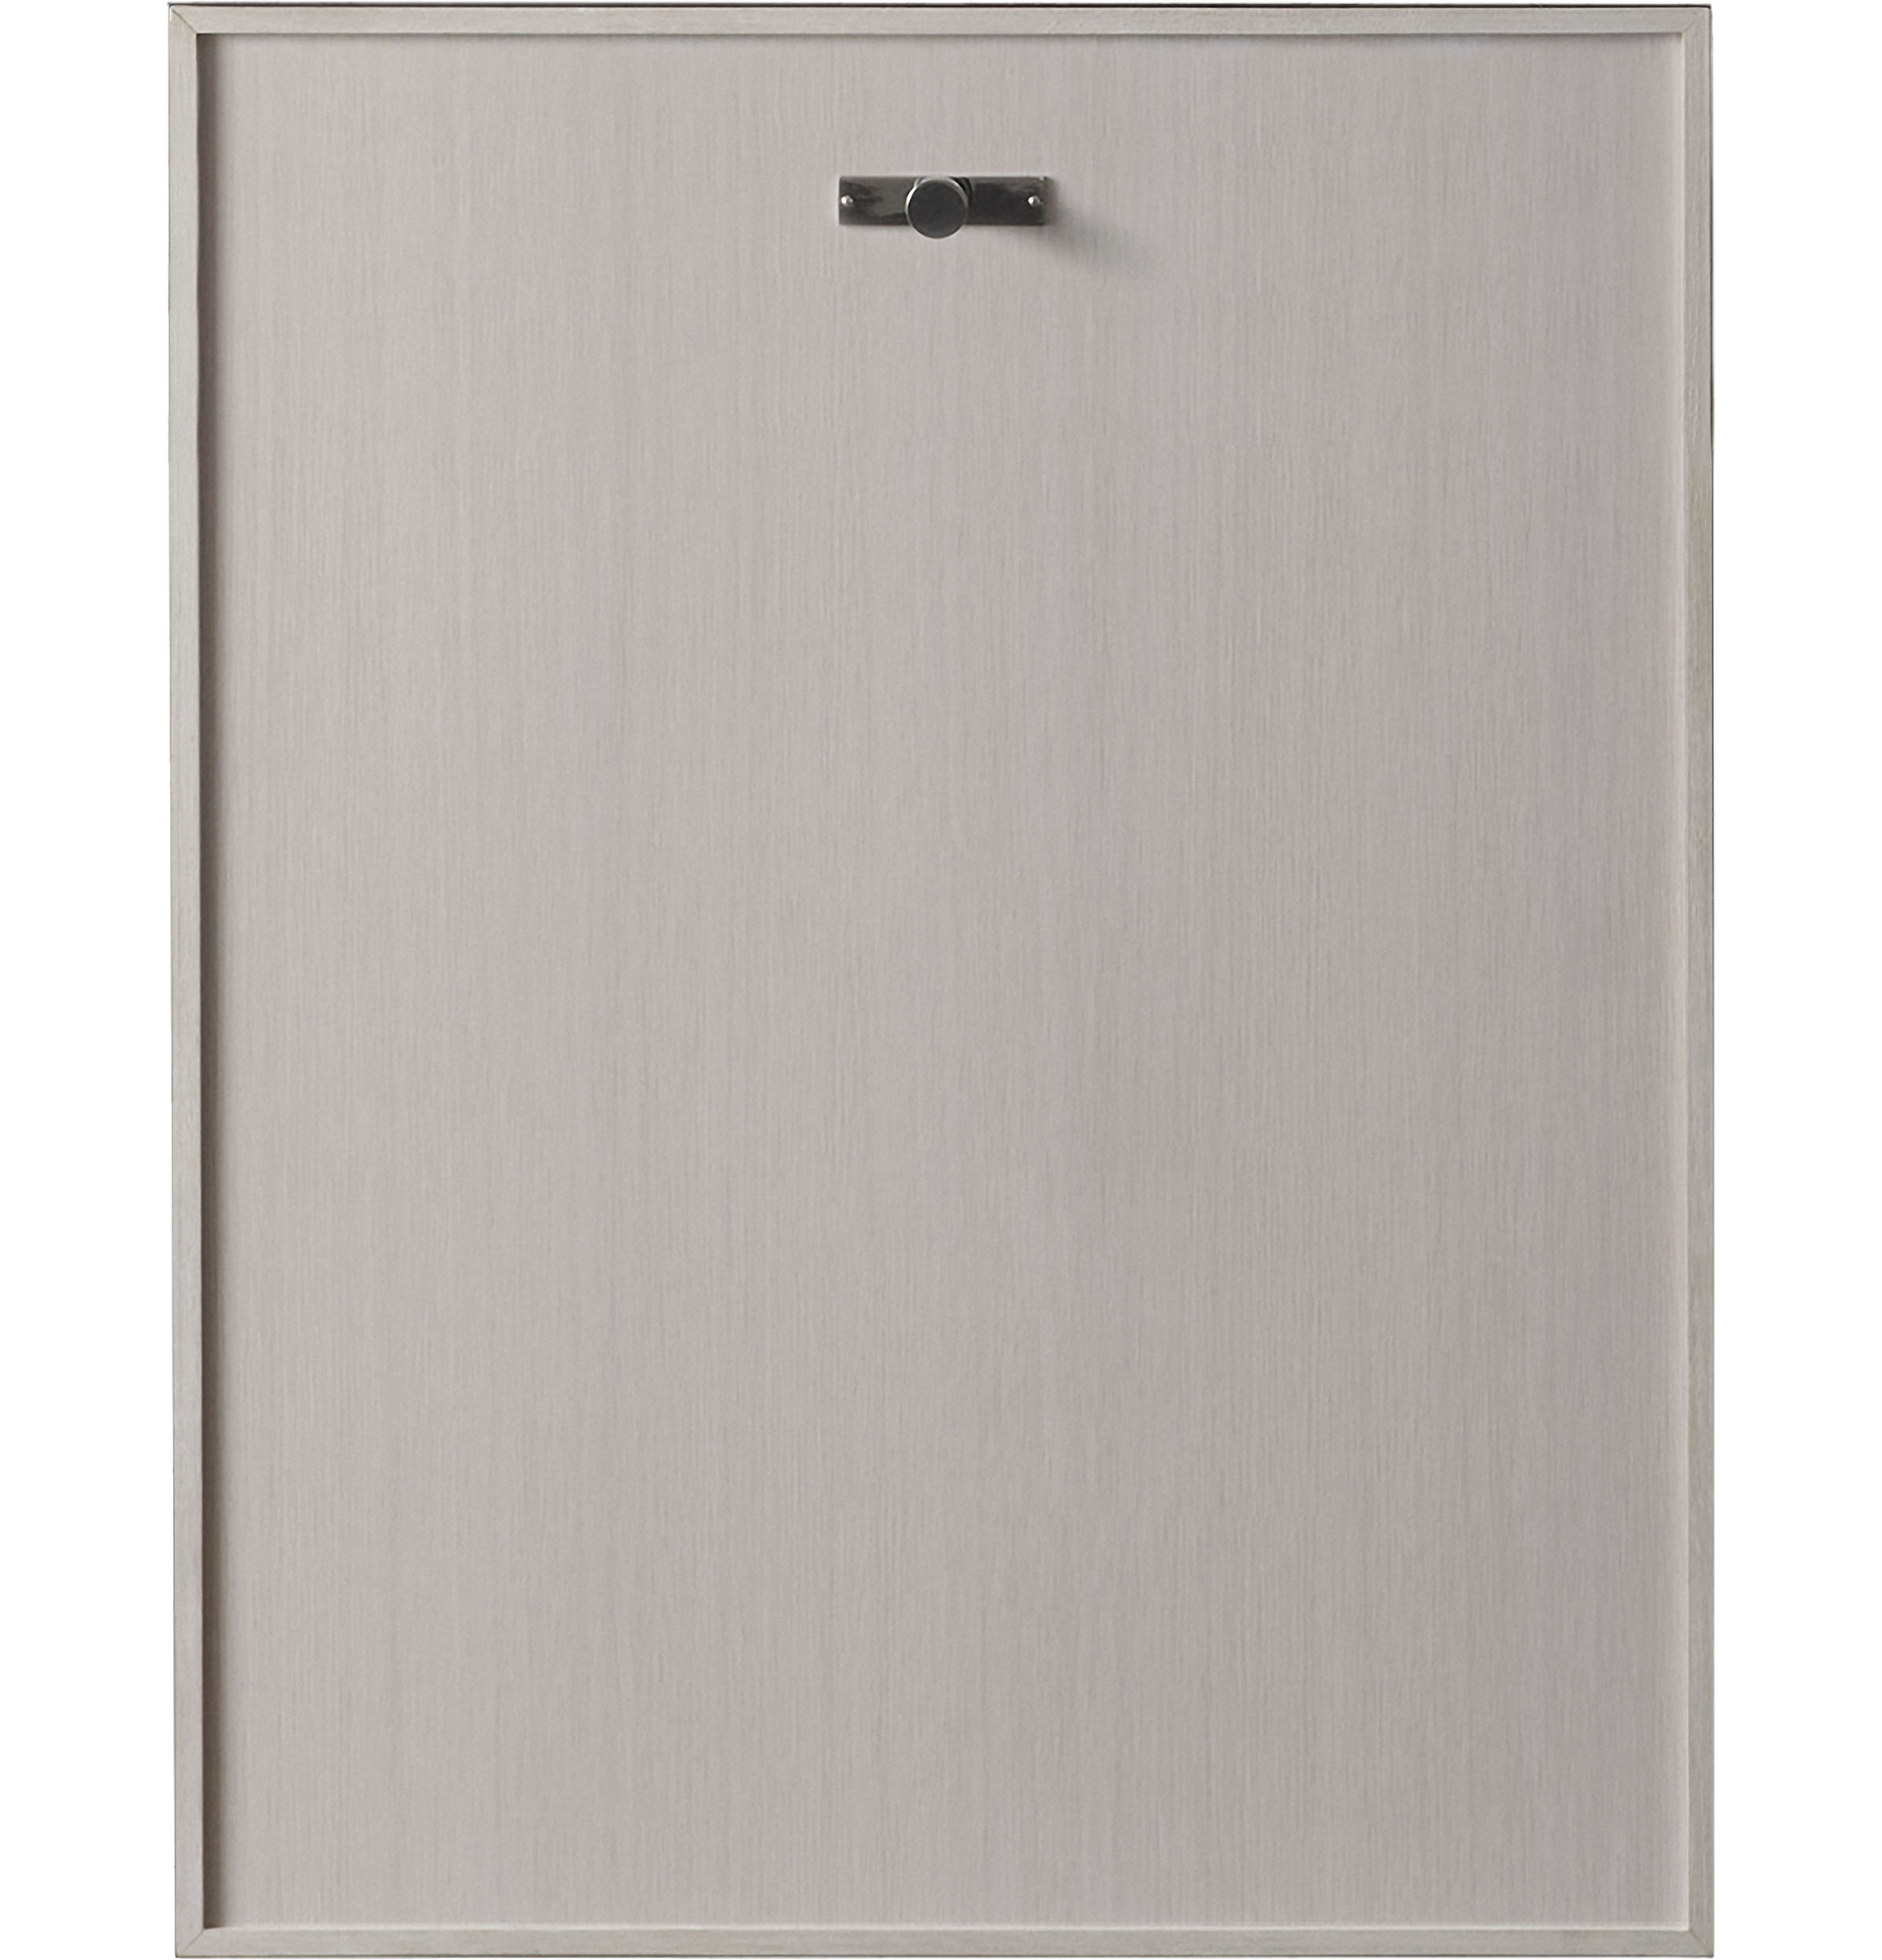 Model: ZDT925SINII | Monogram Monogram Smart Fully Integrated Dishwasher